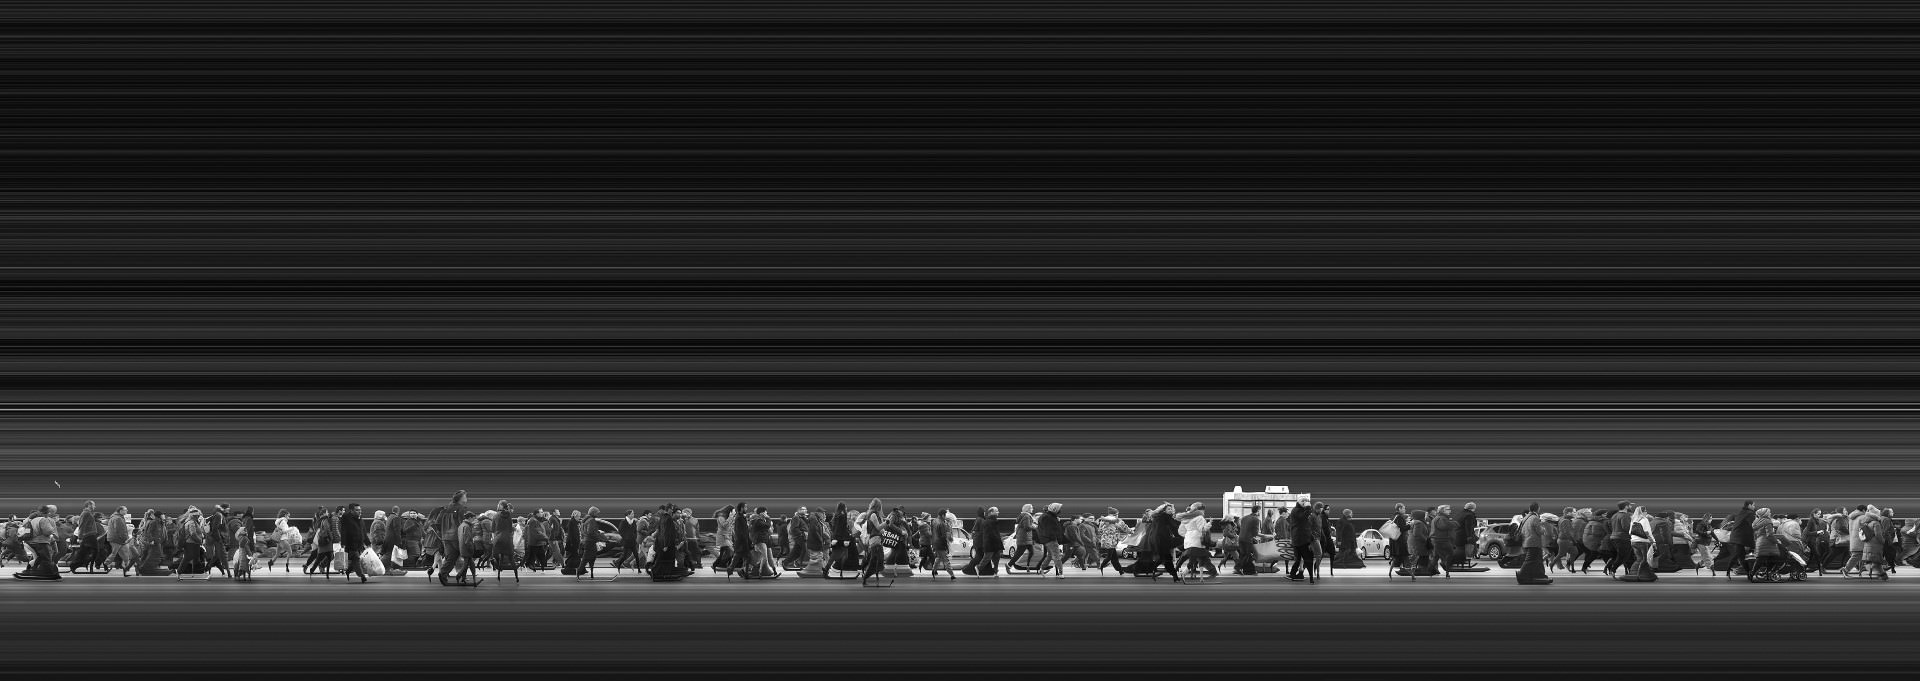 Magyar Ádám, Urban Flow 1837 (New York) (Urban Flow sorozat) I Urban Flow 1837 (New York) (Urban Flow series), 2015 © Magyar Ádám/ Courtesy of Faur Zsófi Galéria